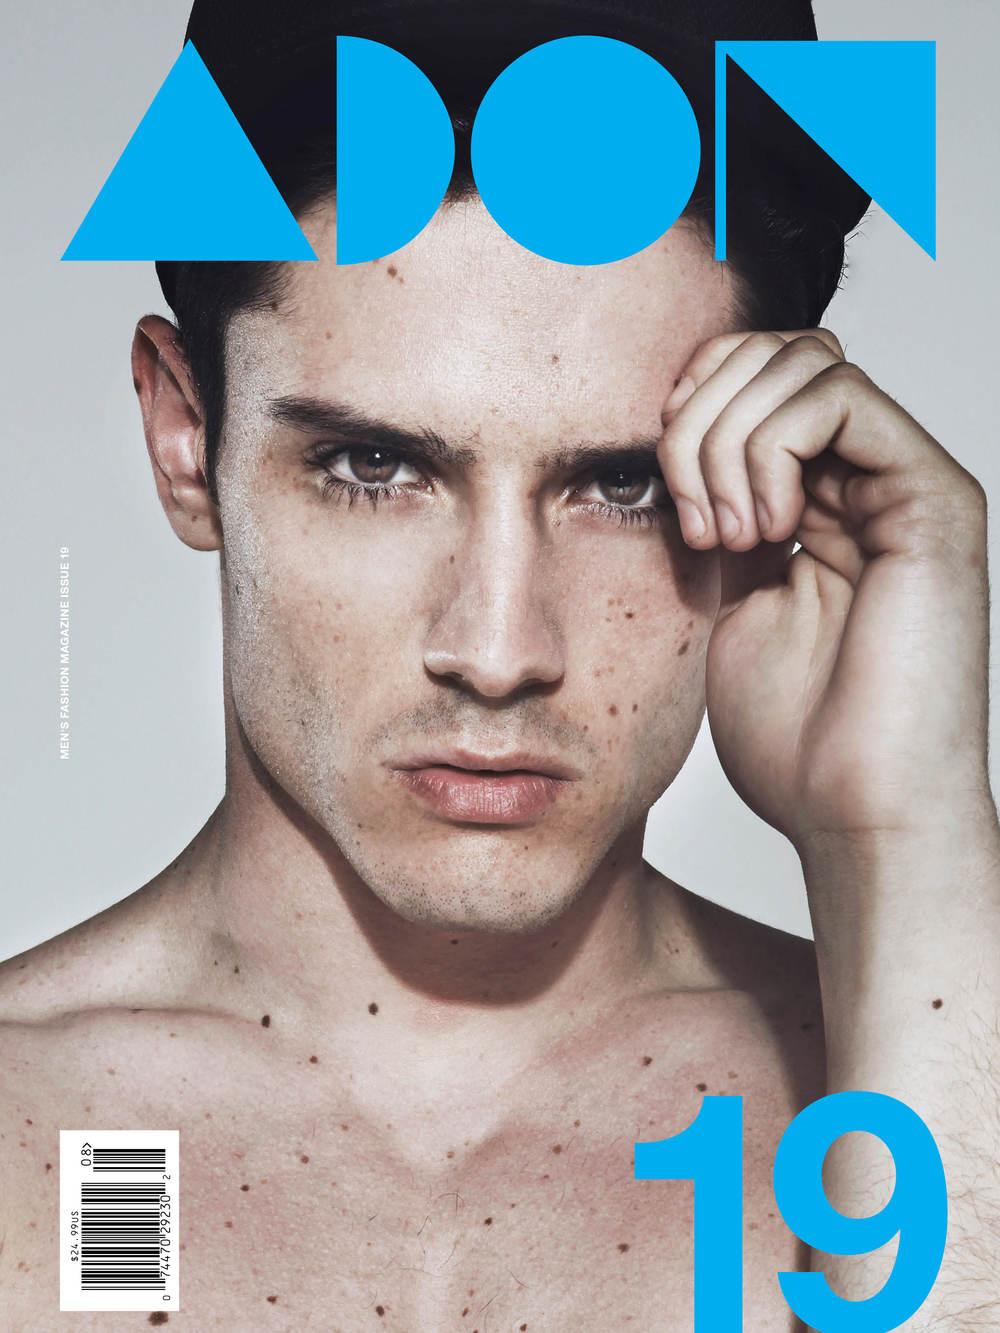 ADON 19_PRESS.jpg